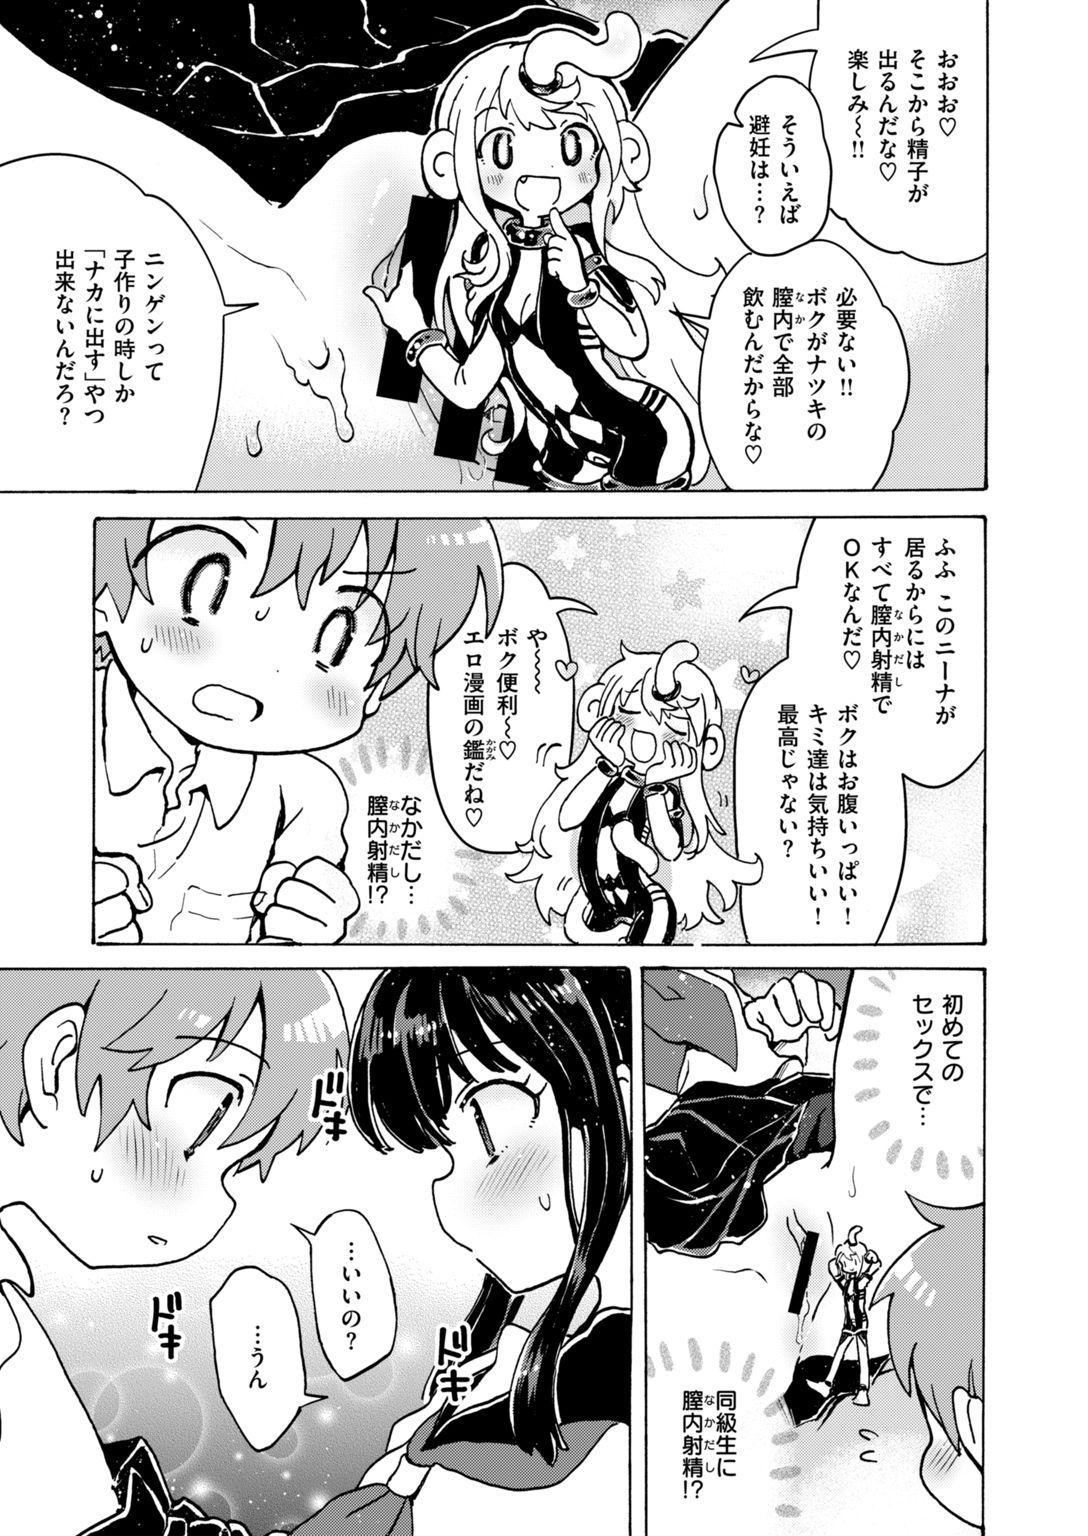 COMIC HAPPINING Vol. 2 19